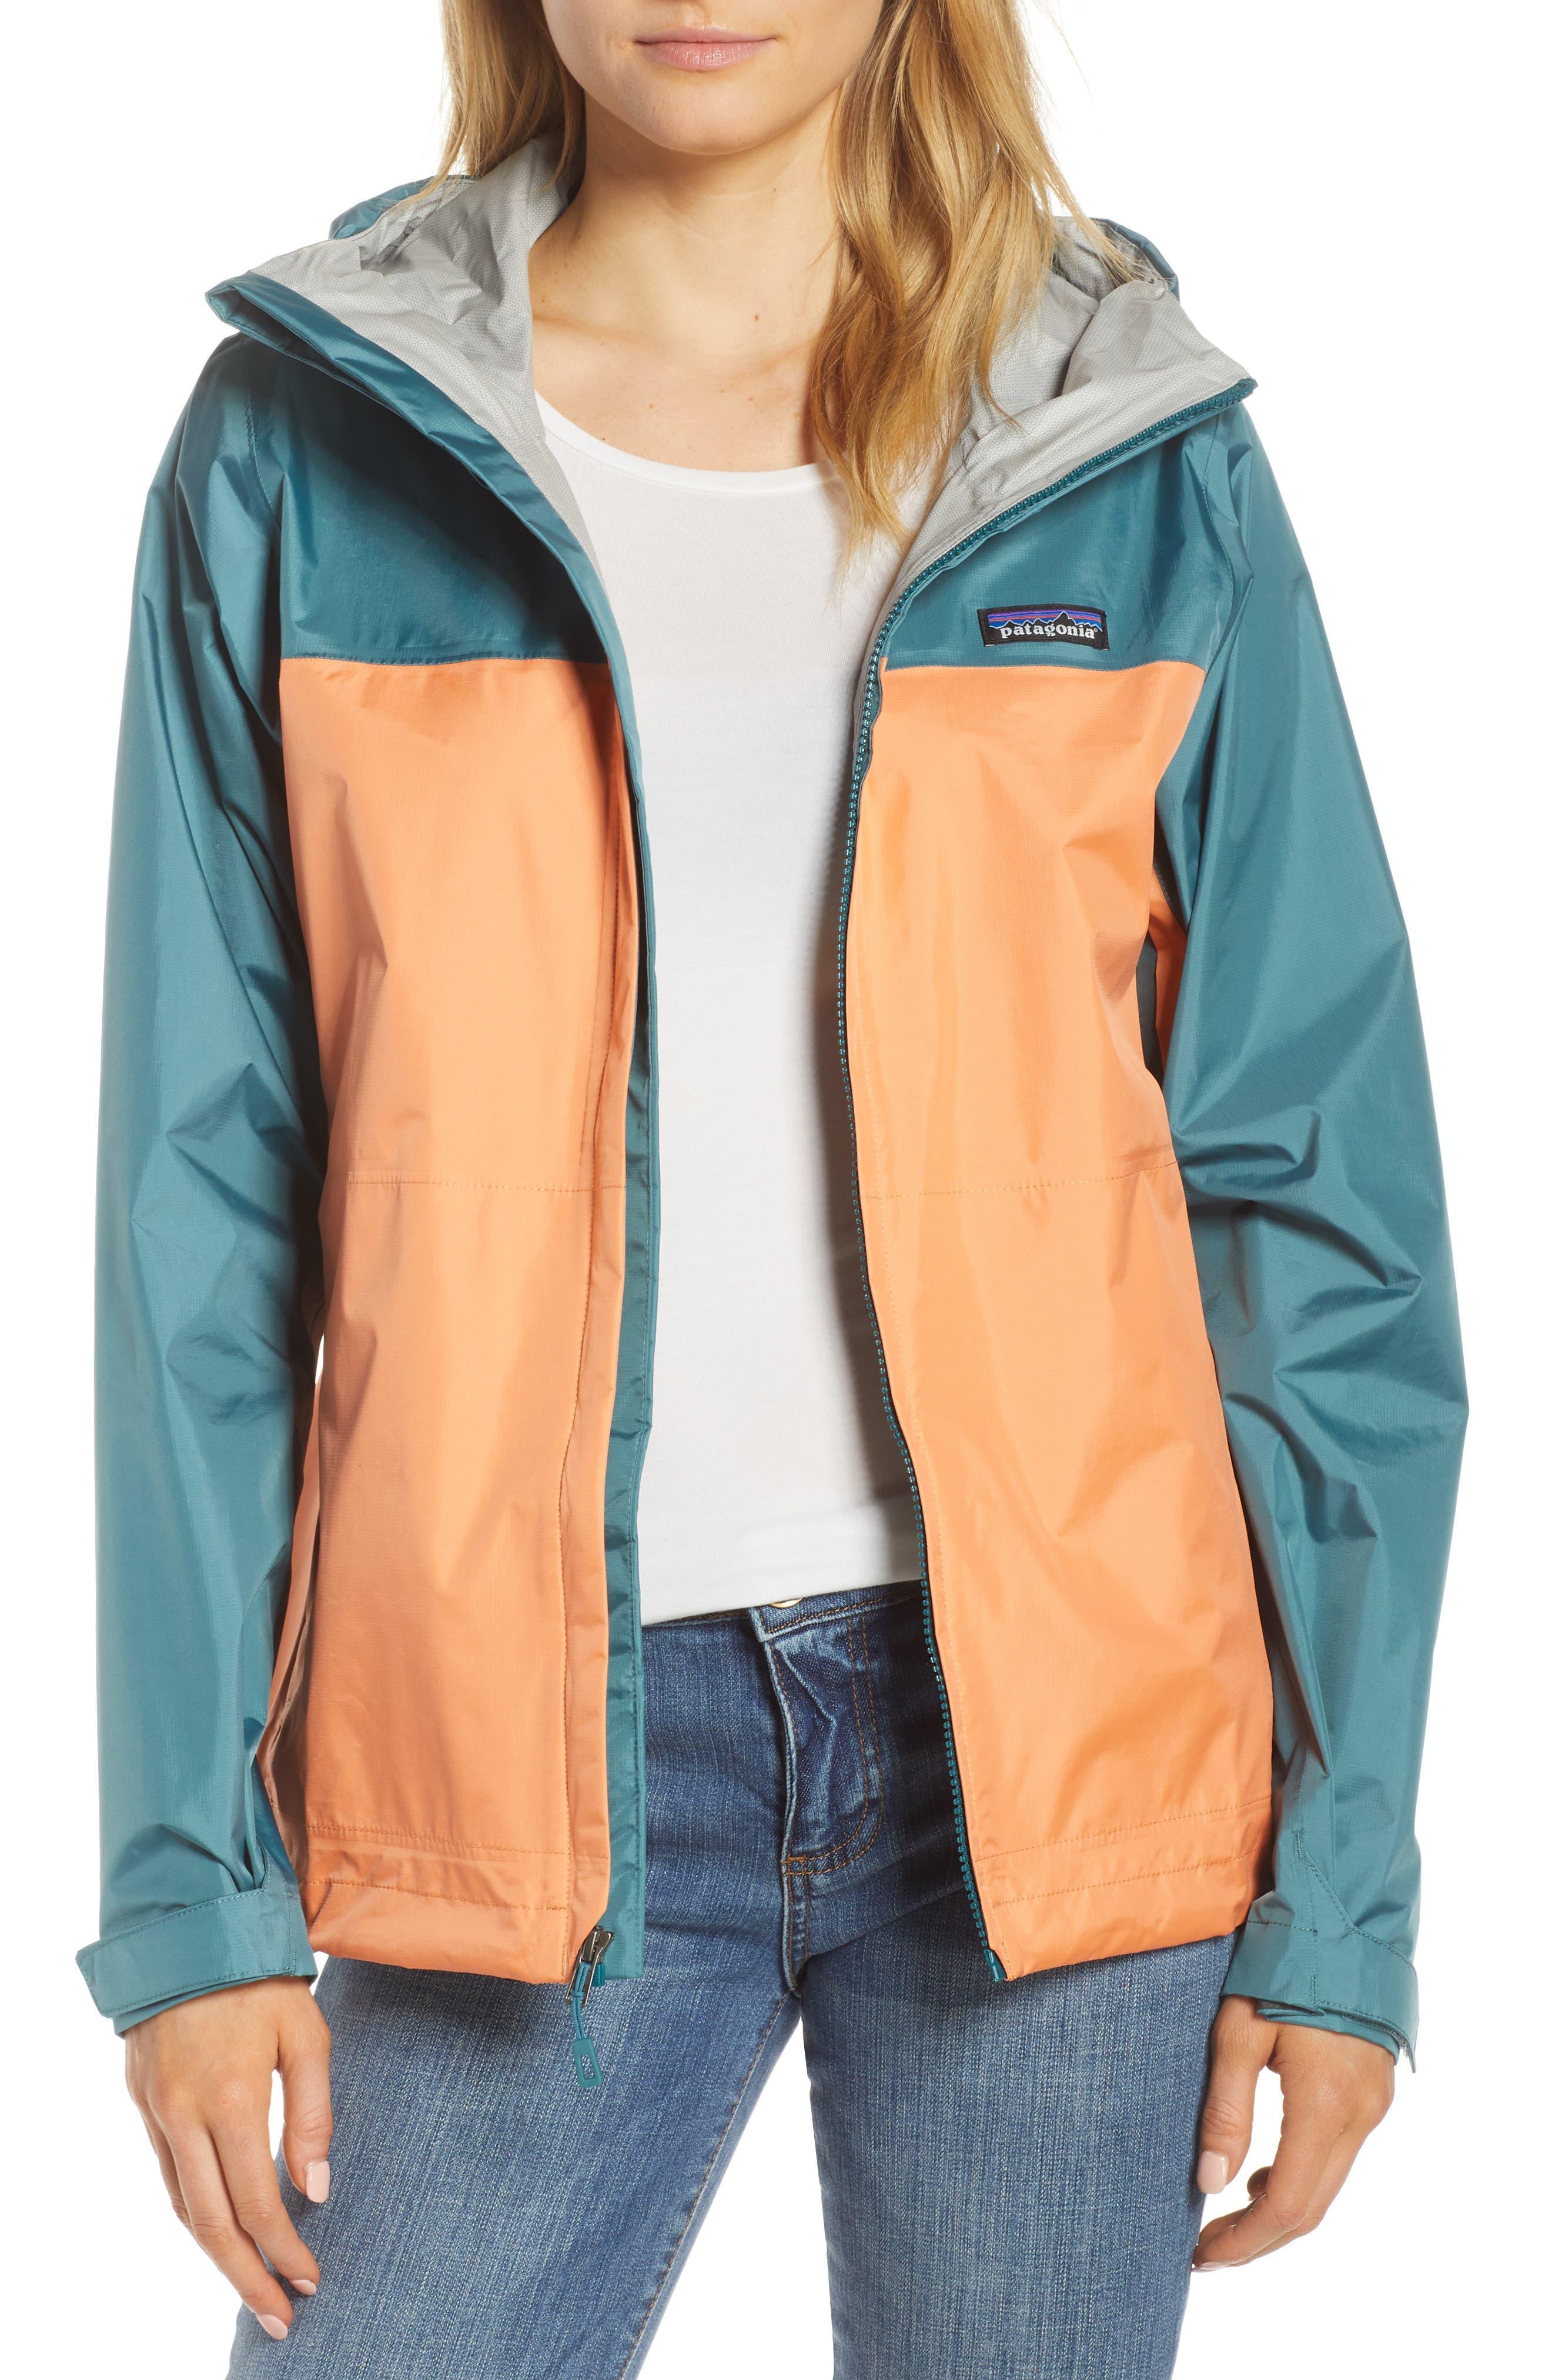 PATAGONIA, Torrentshell Jacket, Main thumbnail 1, color, TASMANIAN TEAL